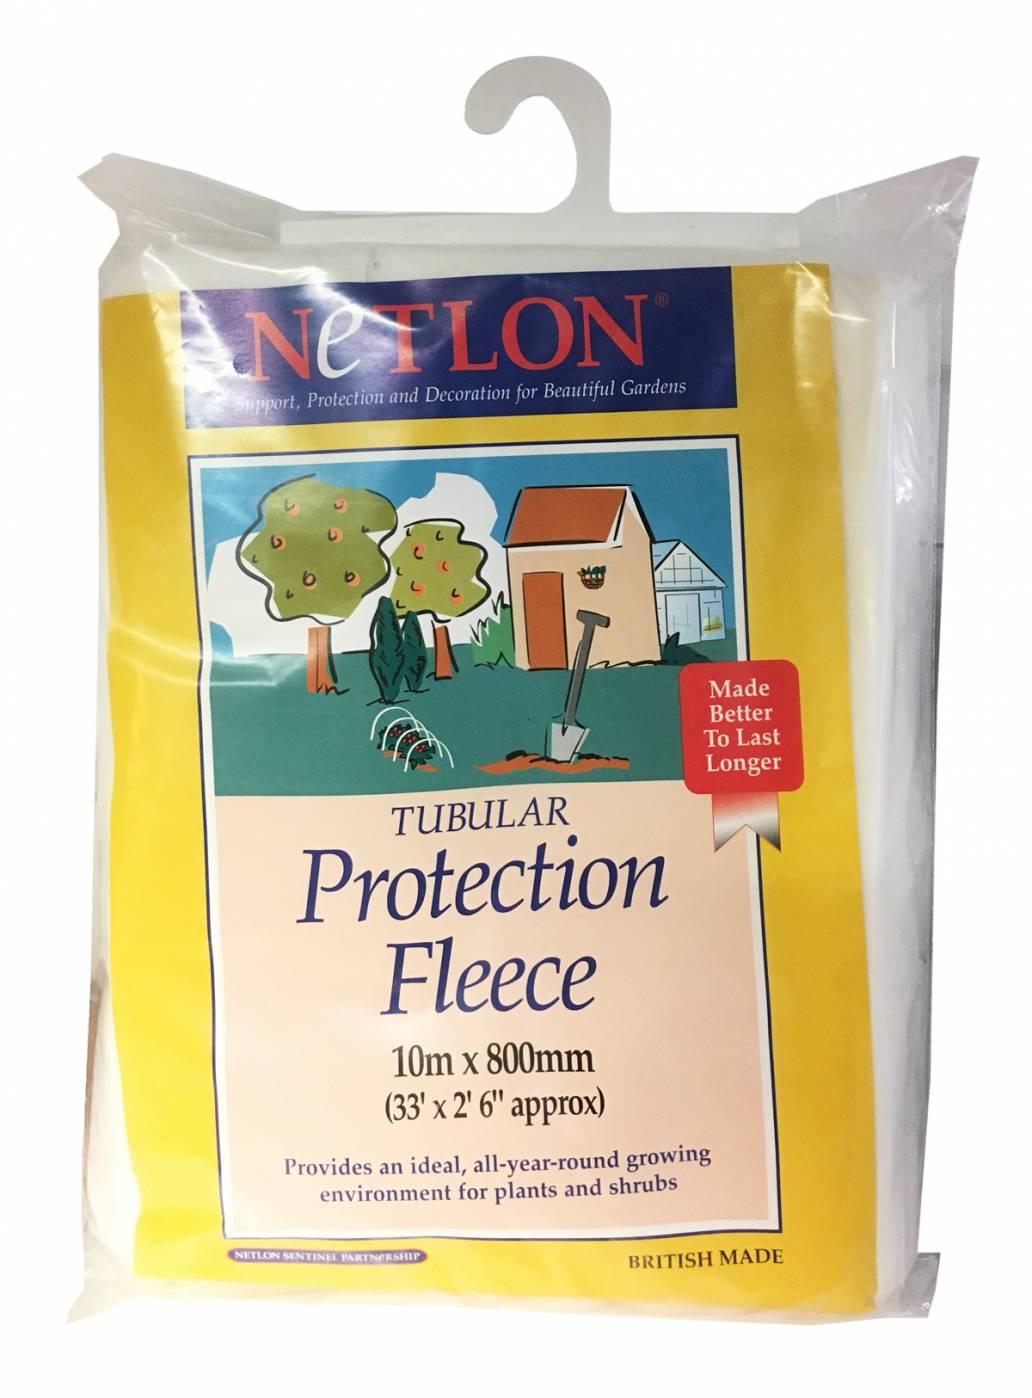 Netlon Tubular Plant Protection Fleece - 10m x 800mm